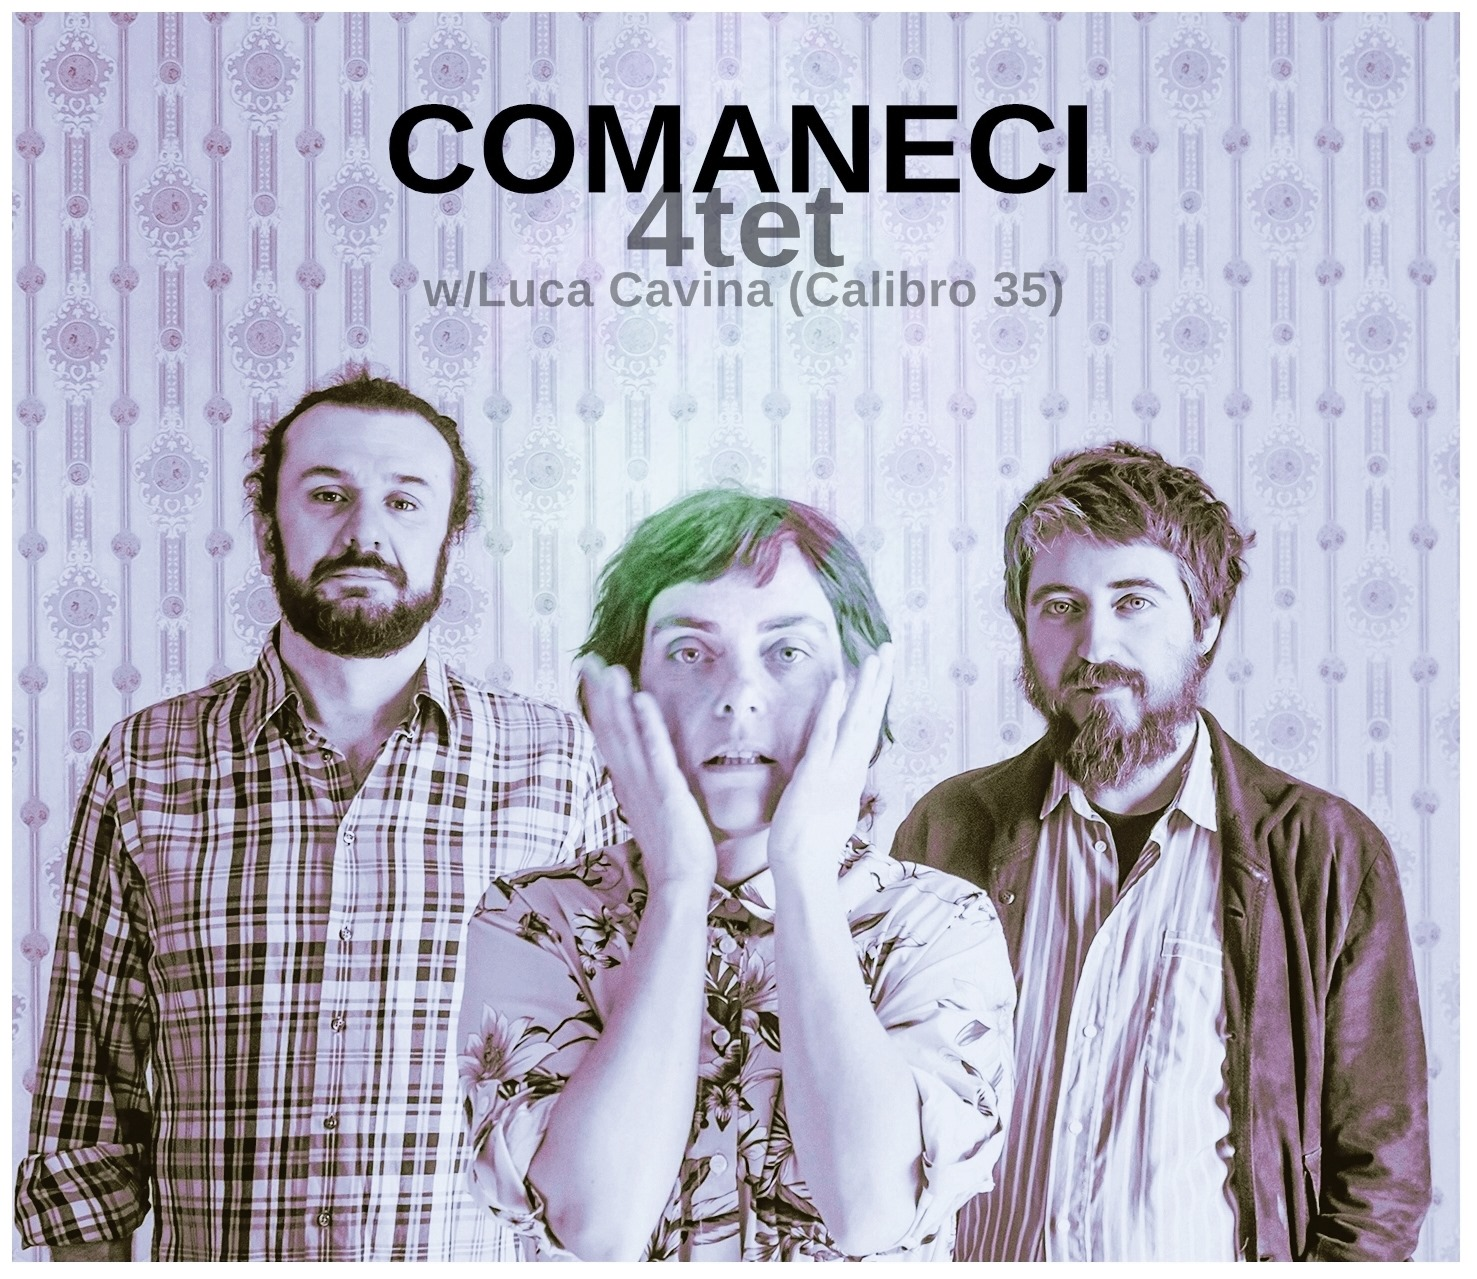 Comaneci (4tet)